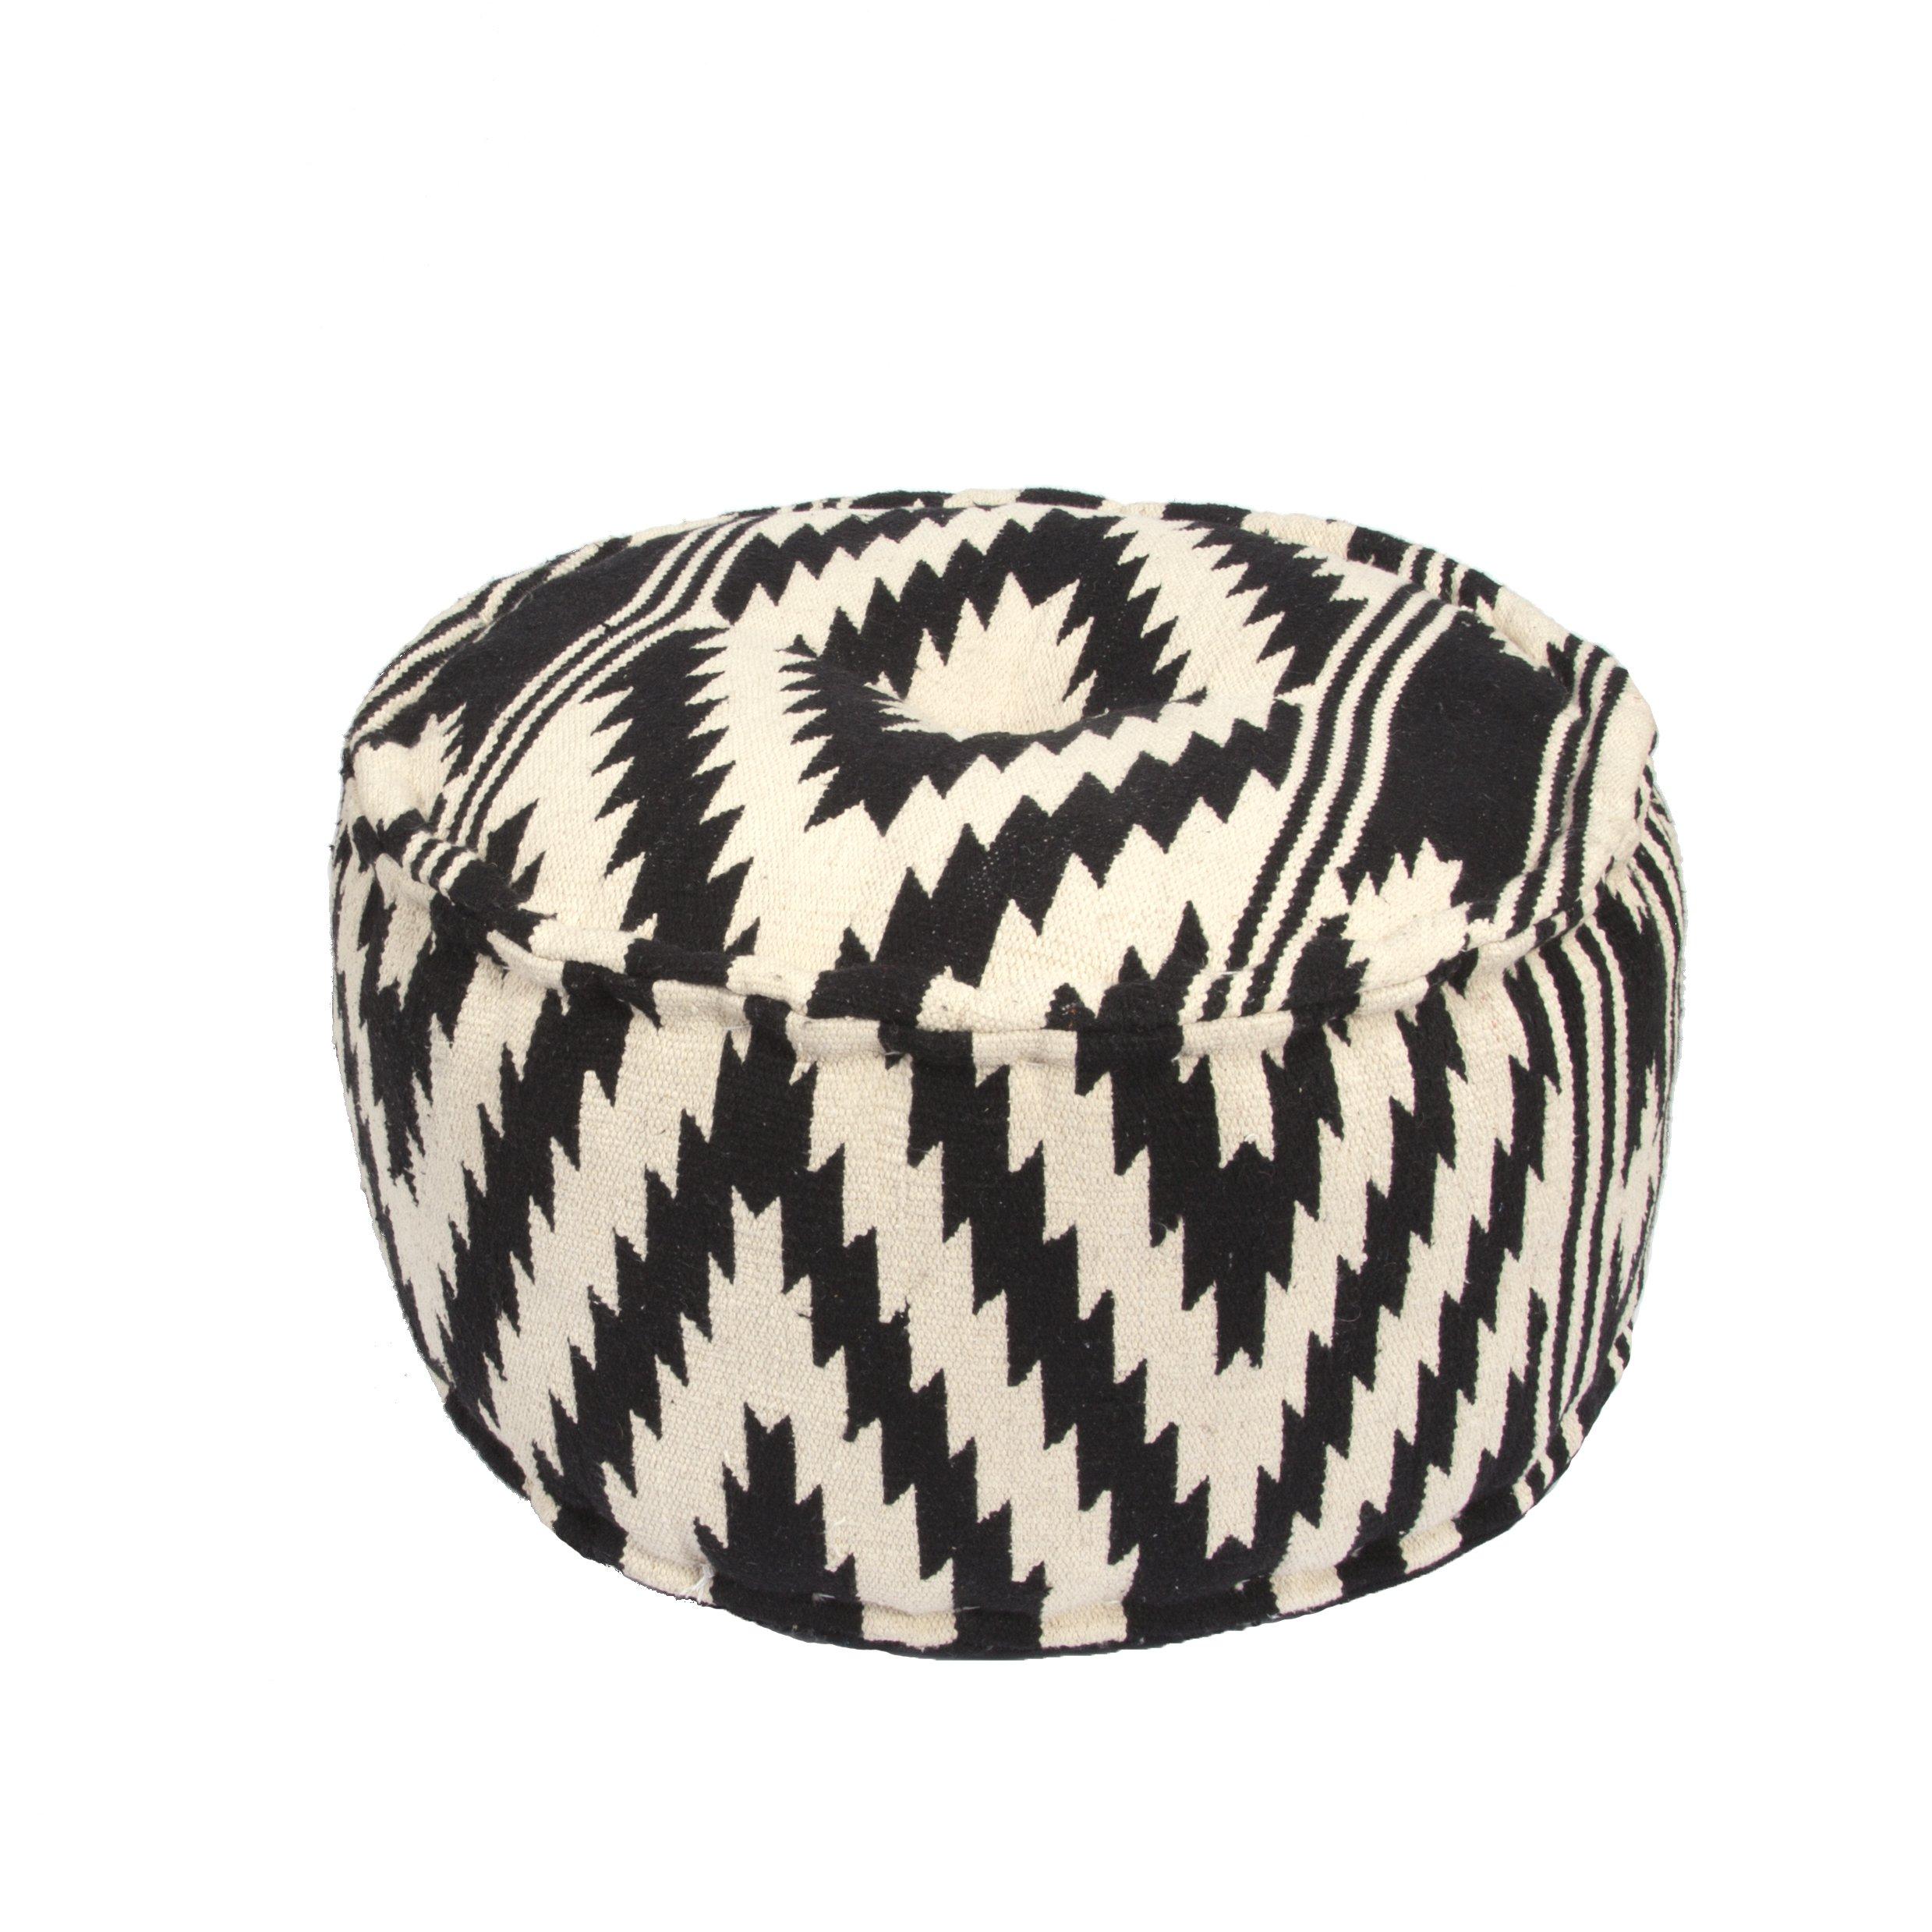 Jaipur Tribal Pattern Black Cotton Pouf, 24-Inch x 24-Inch x 12-Inch, Peat Geo